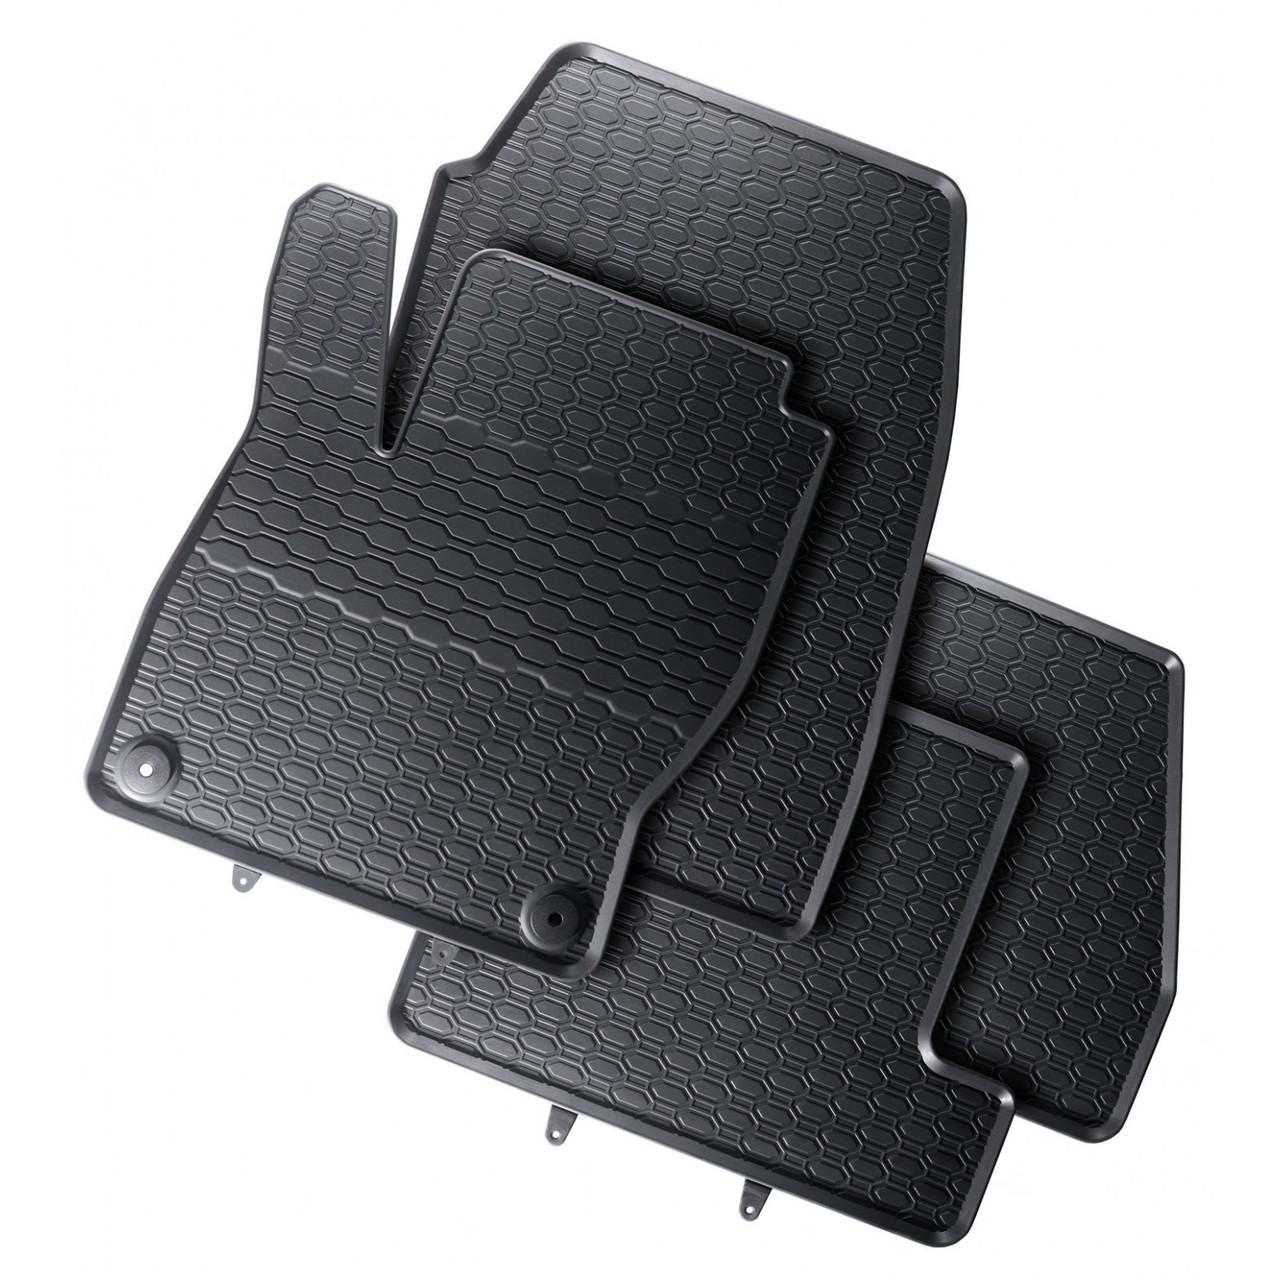 Килимки в салон для Ford Focus III (11-) (4шт) 853/4C